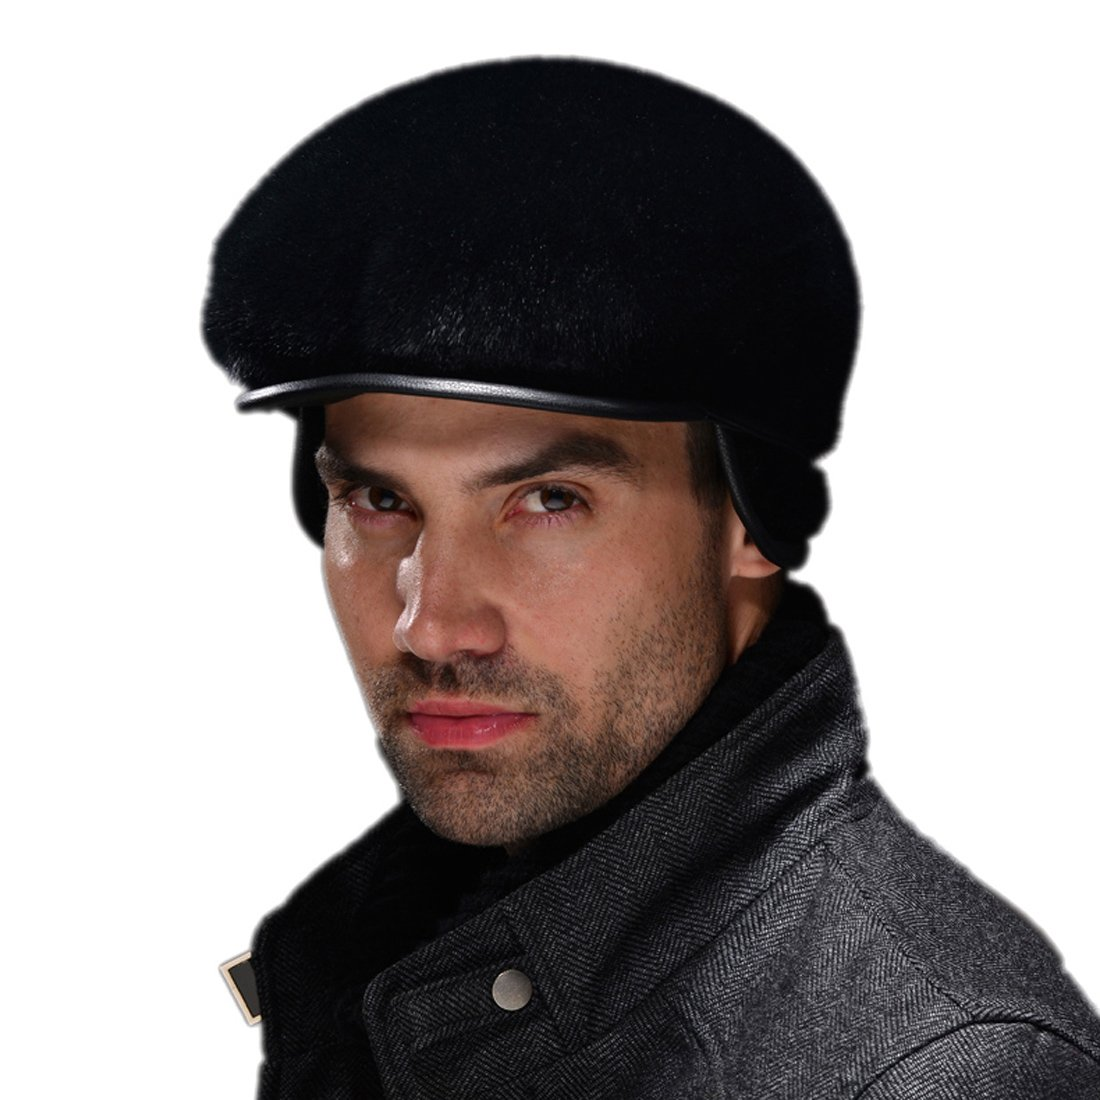 URSFUR Men's Sealskin Full Fur Cabbie Cap with Ear Flap Hat (Black)